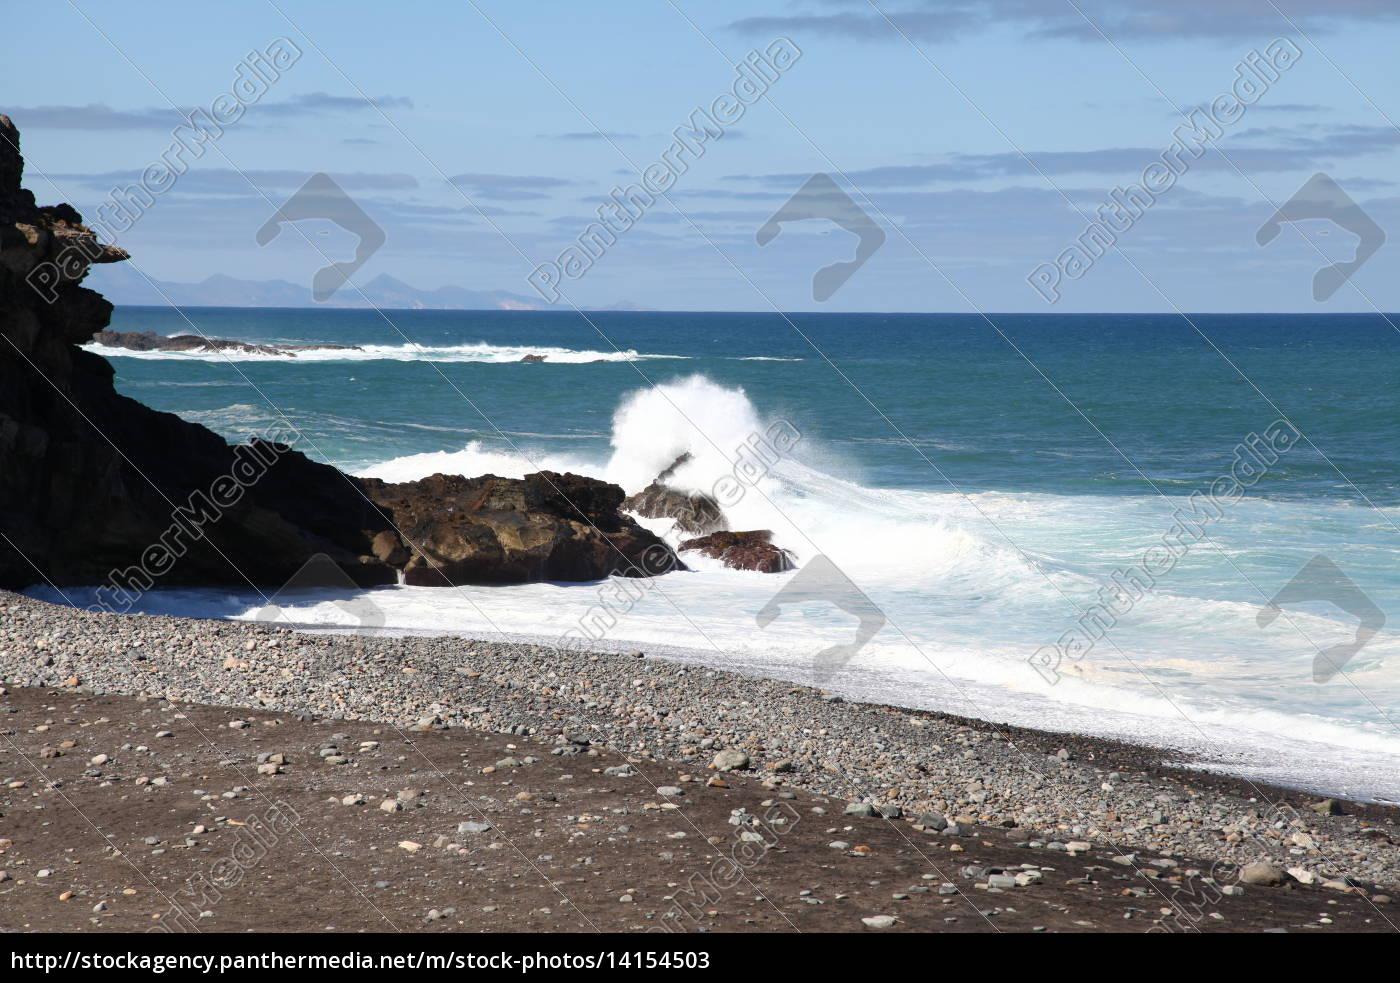 atlantico, acqua salata, mare, oceano, acqua, canarie - 14154503